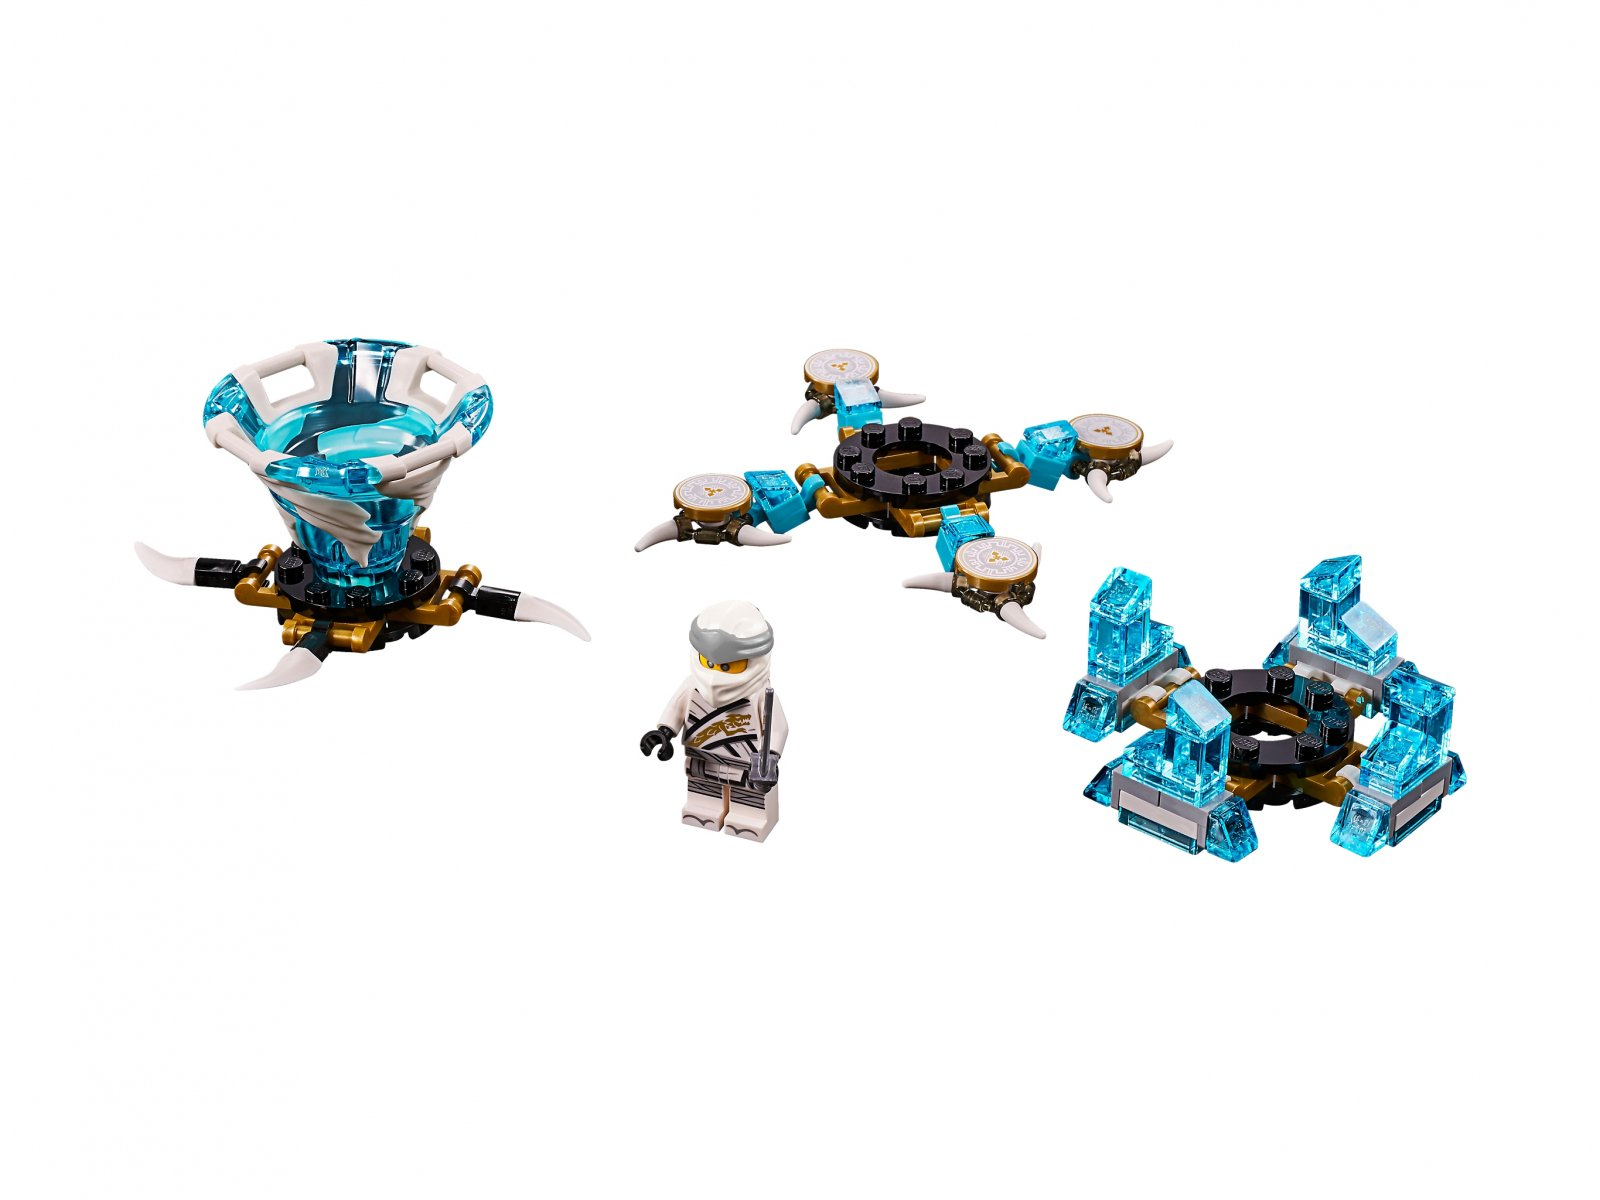 LEGO Ninjago® 70661 Spinjitzu Zane